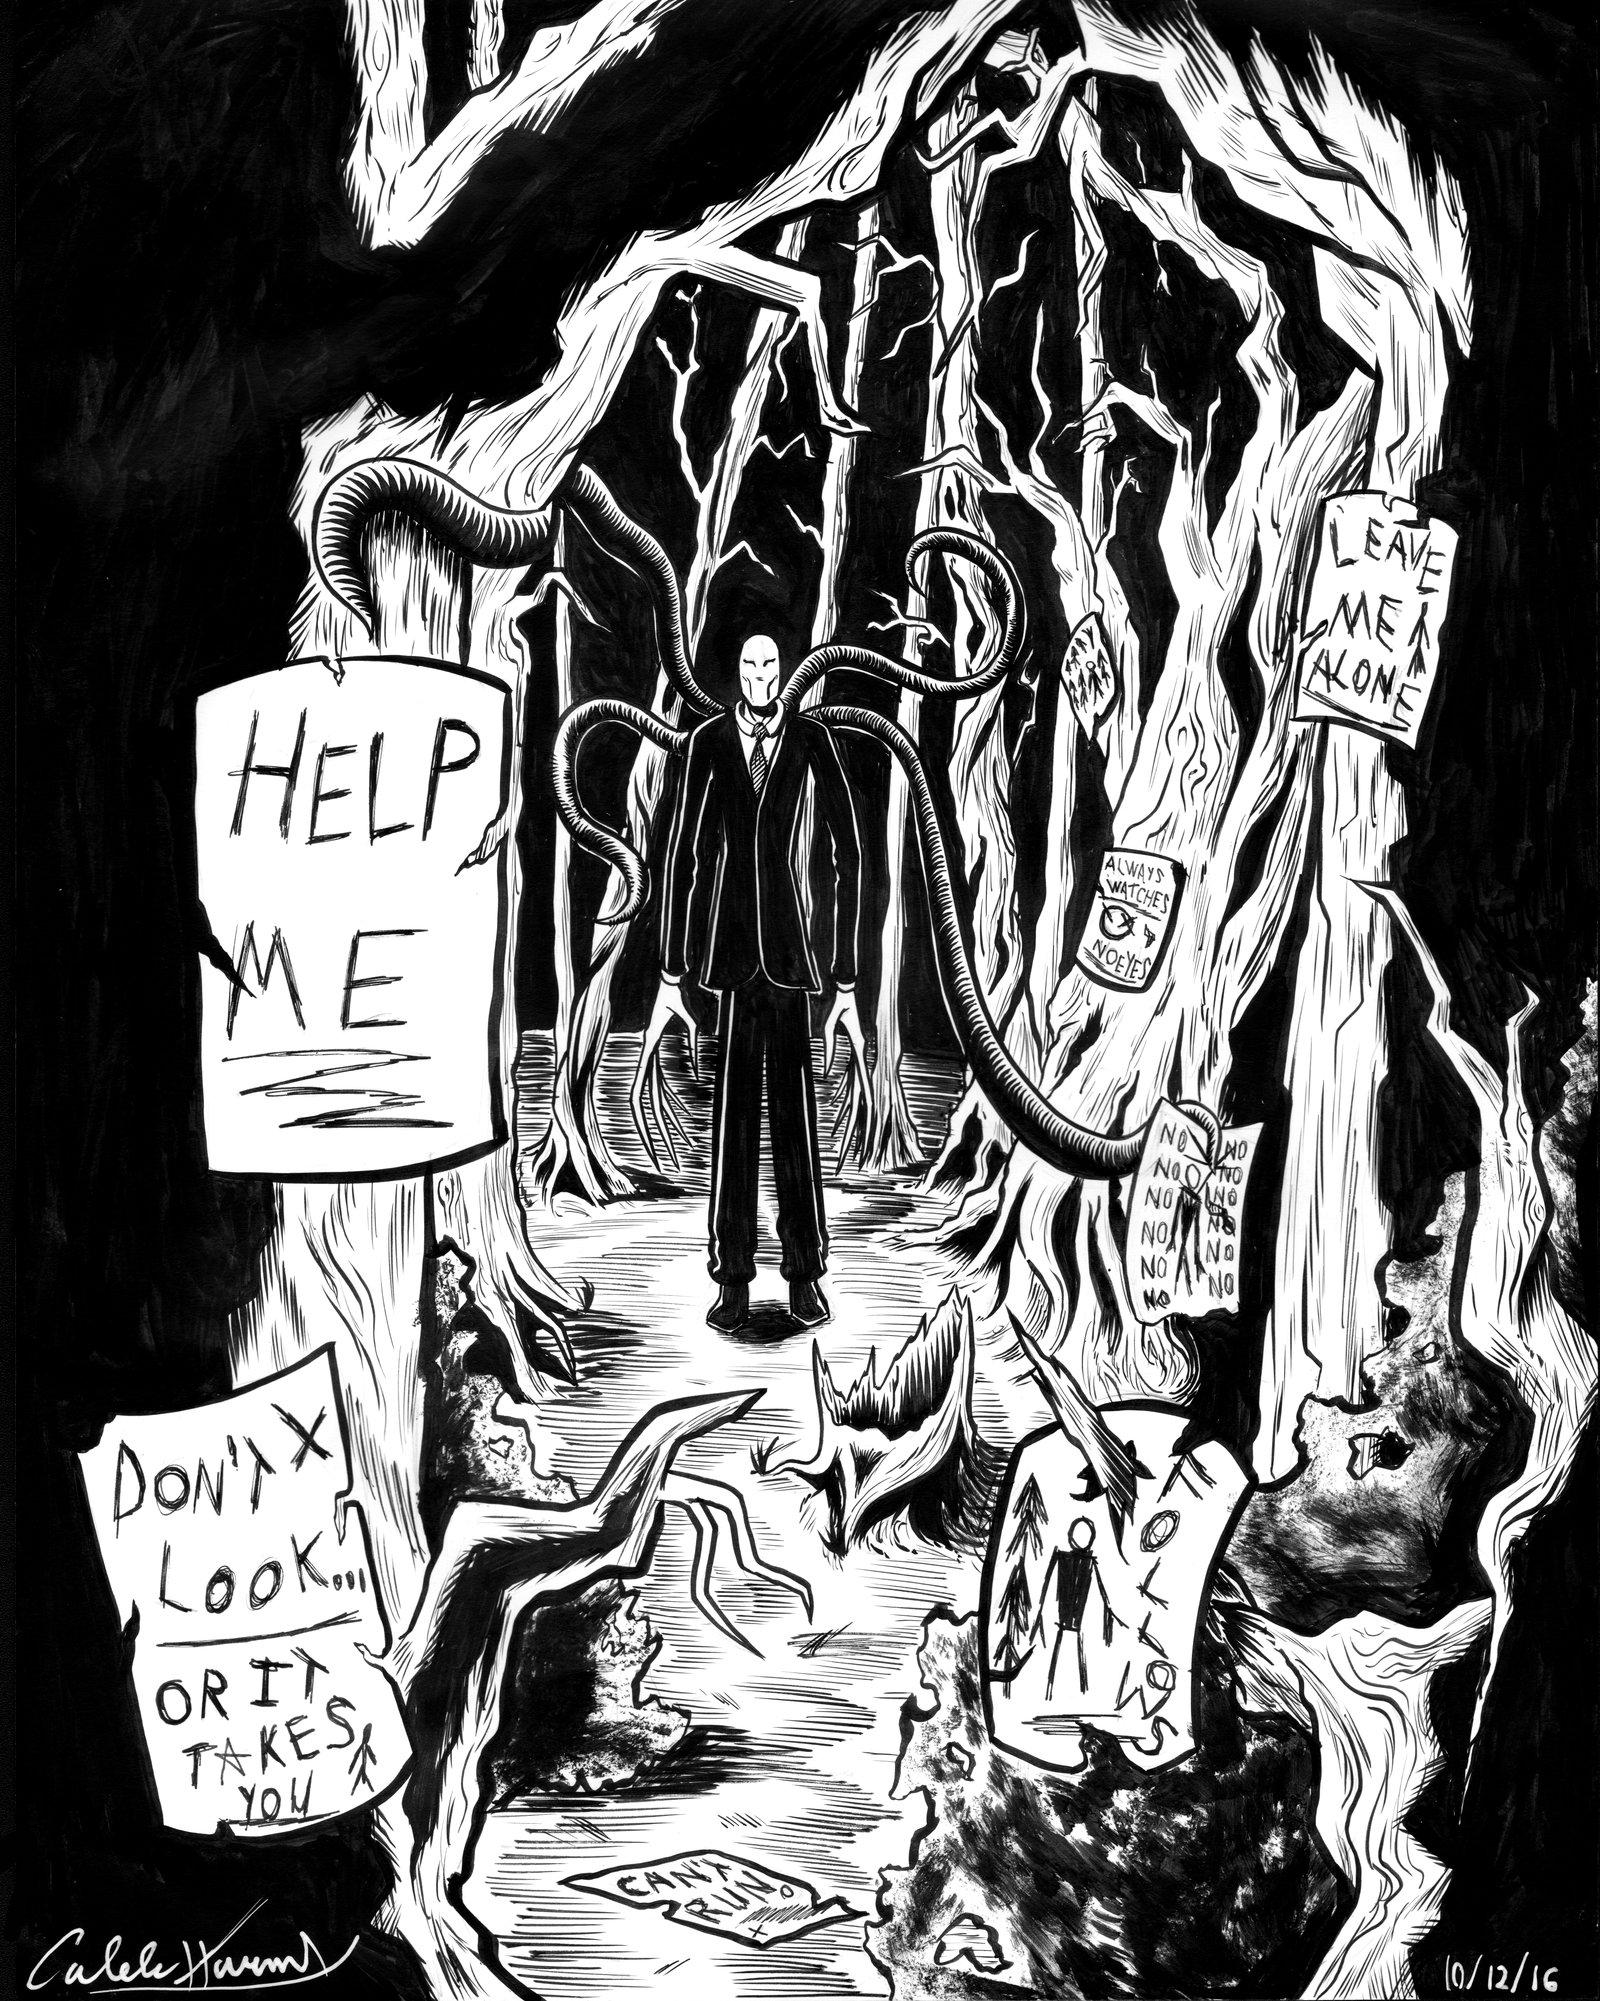 Inktober/Drawlloween #6 'The Slender Man'